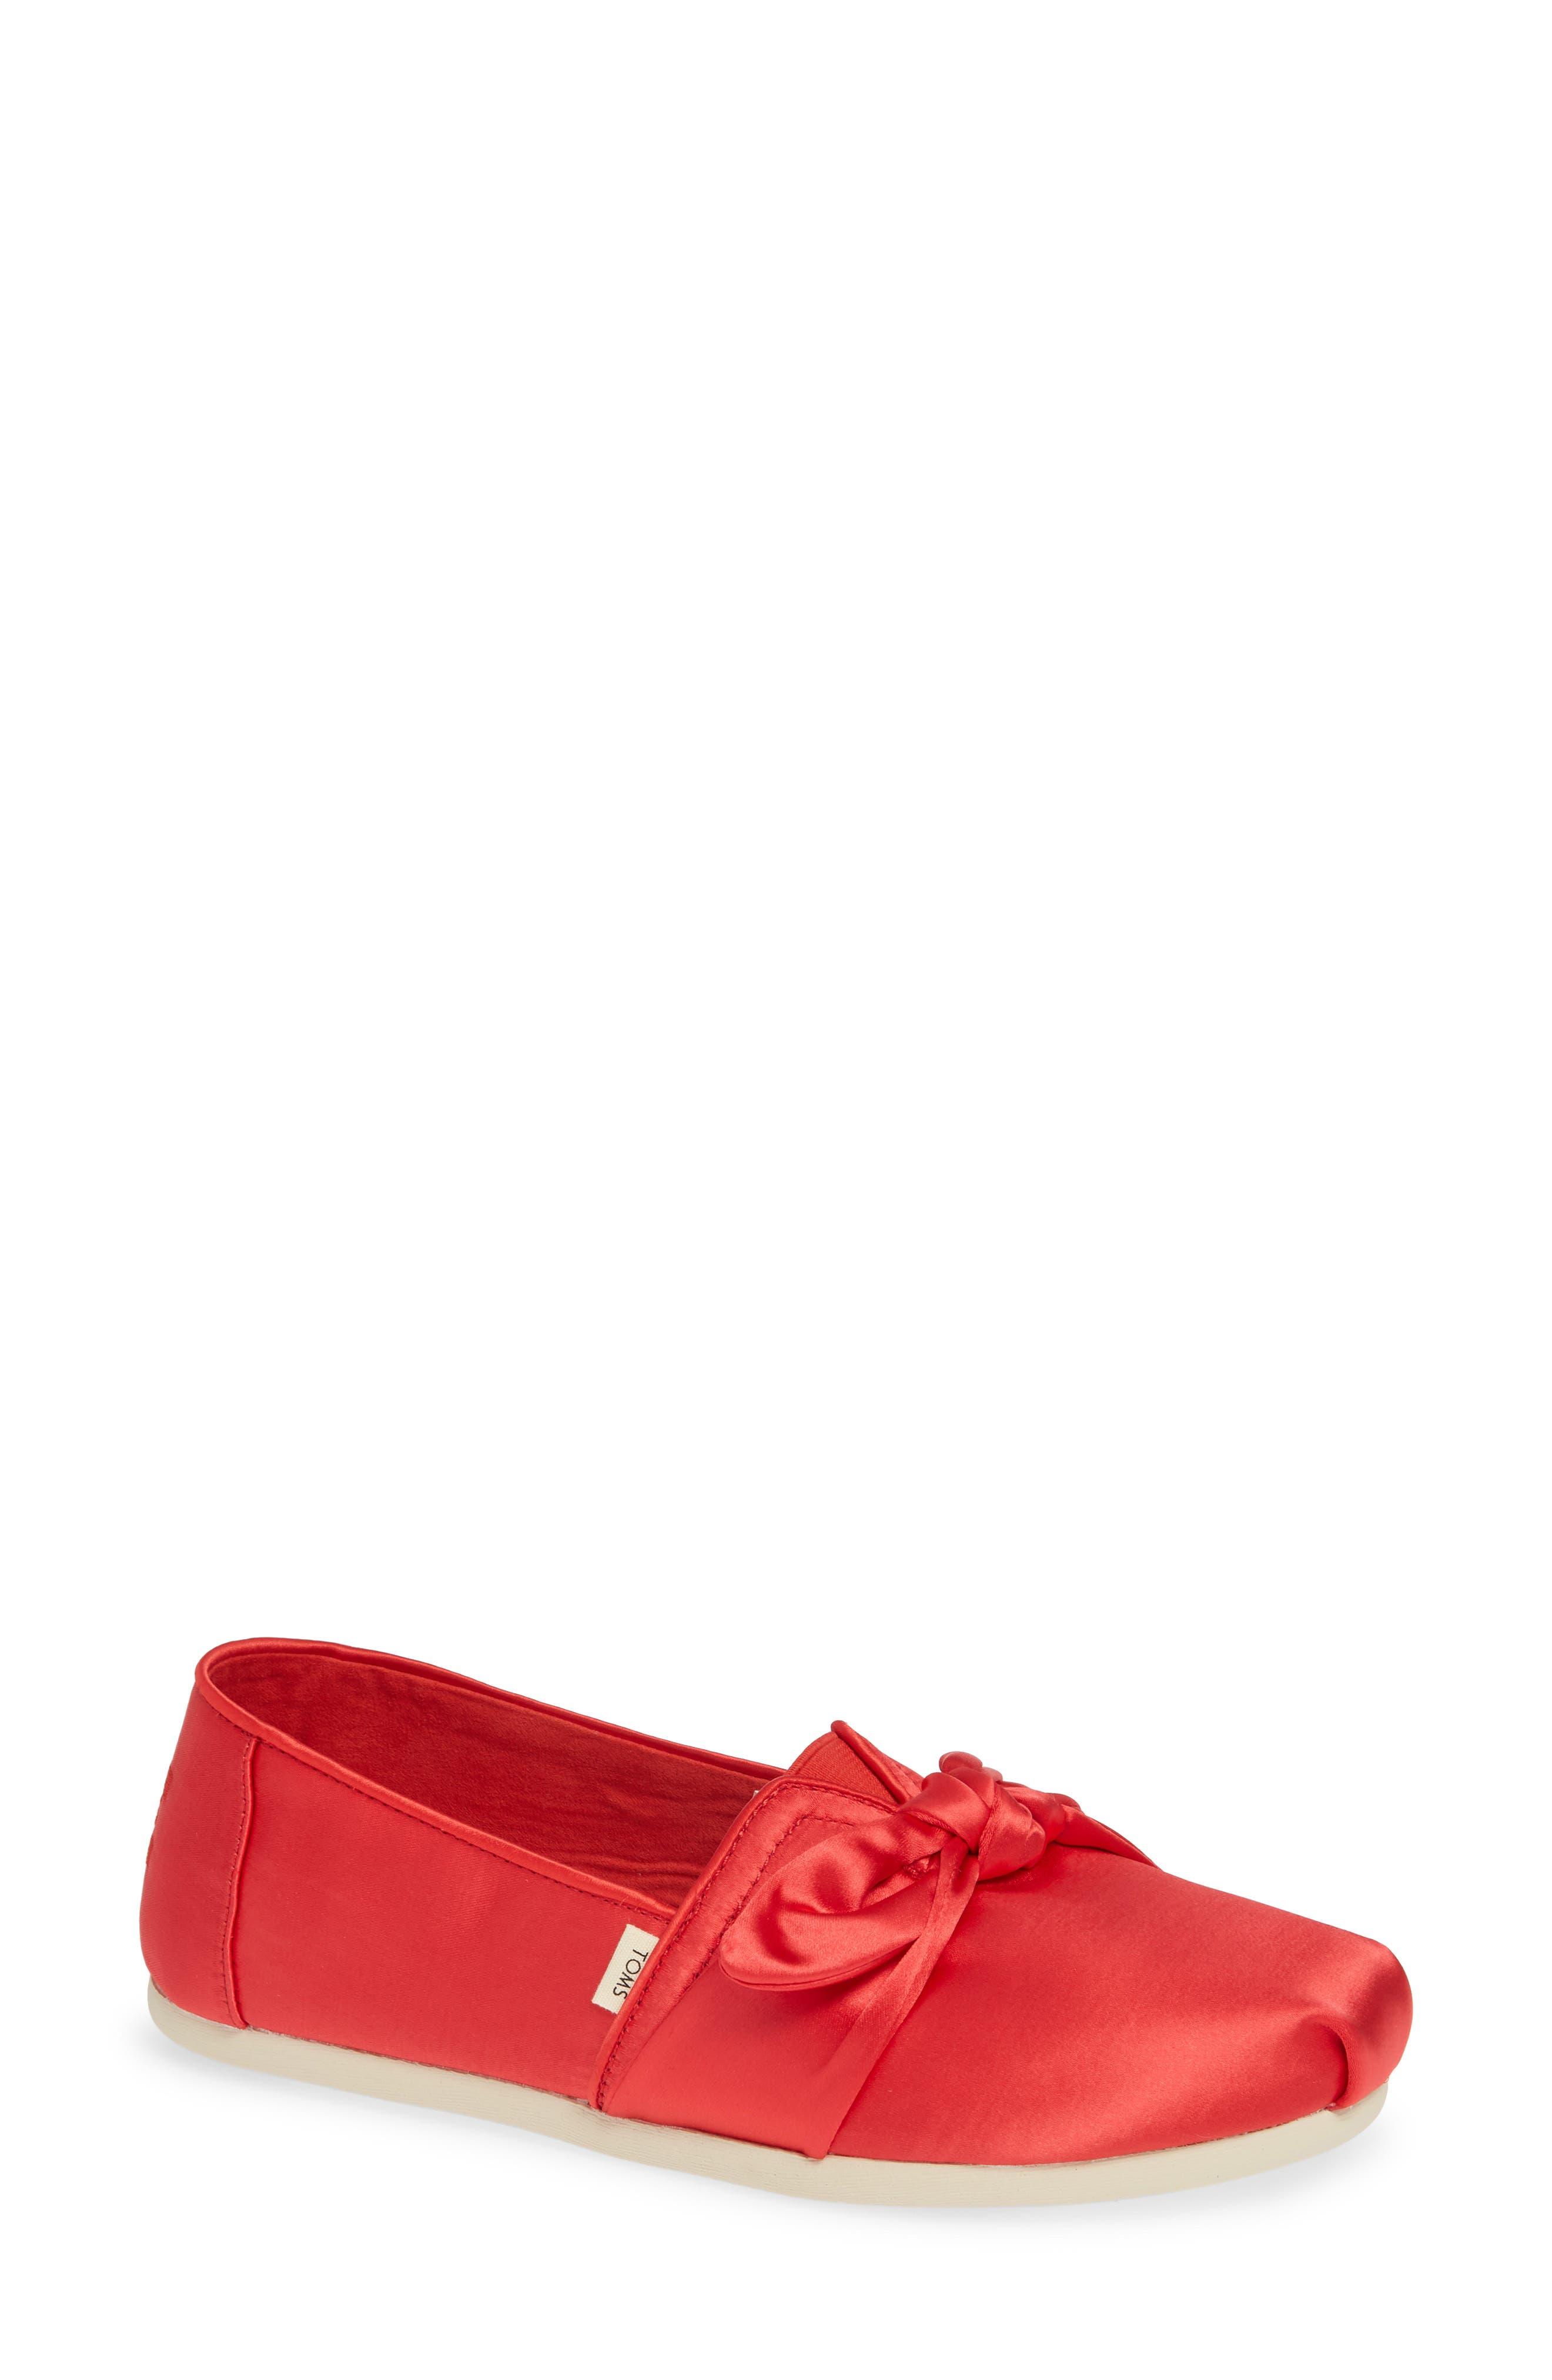 TOMS Alpargata Bow Slip-On, Main, color, RED LAVA FABRIC